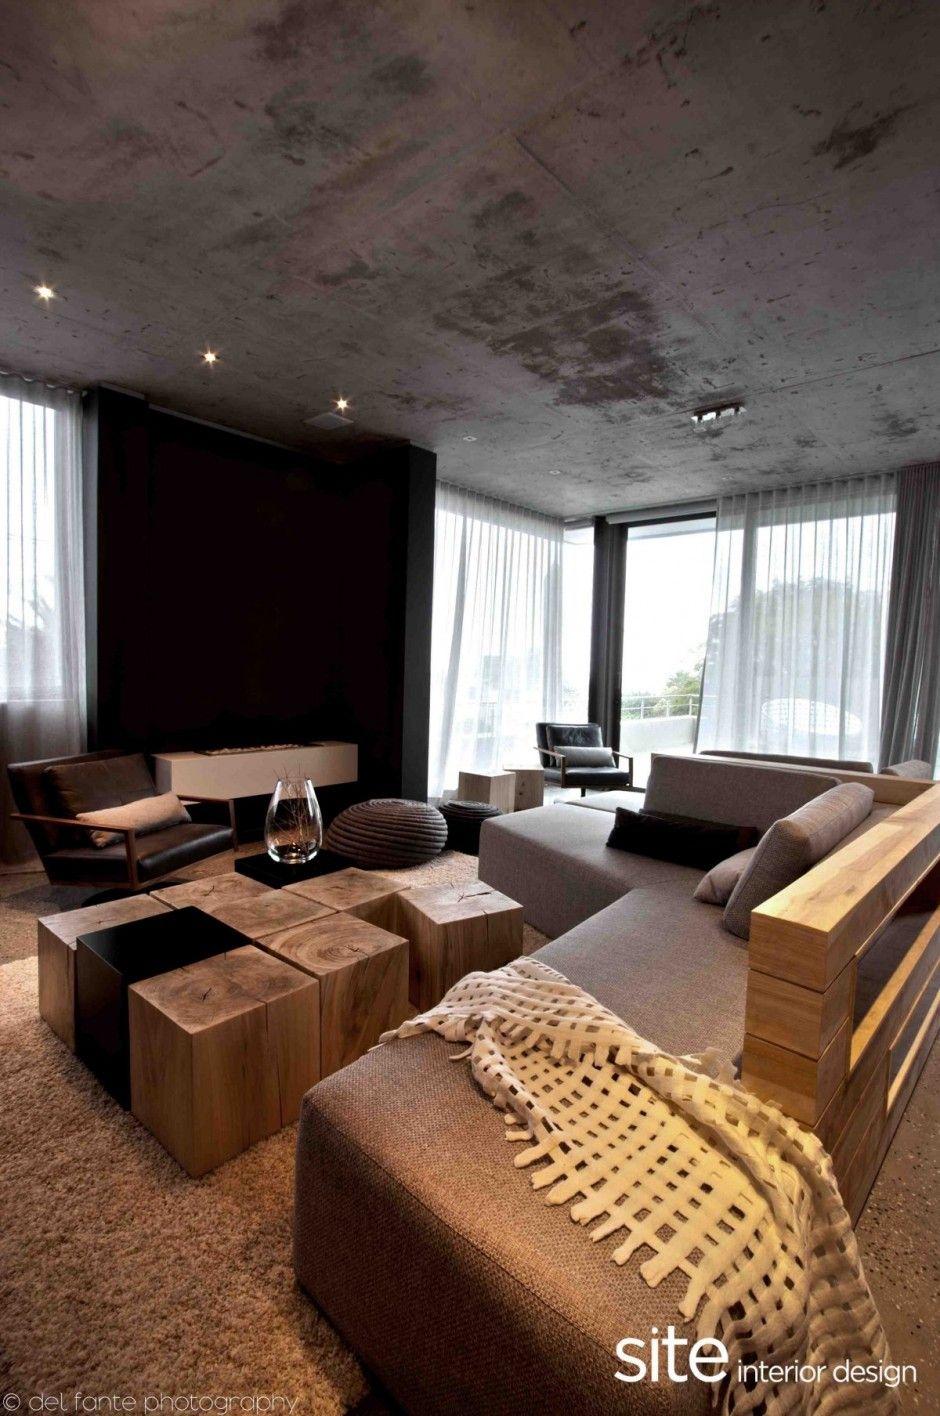 70 Moderne Innovative Luxus Interieur Ideen Furs Wohnzimmer